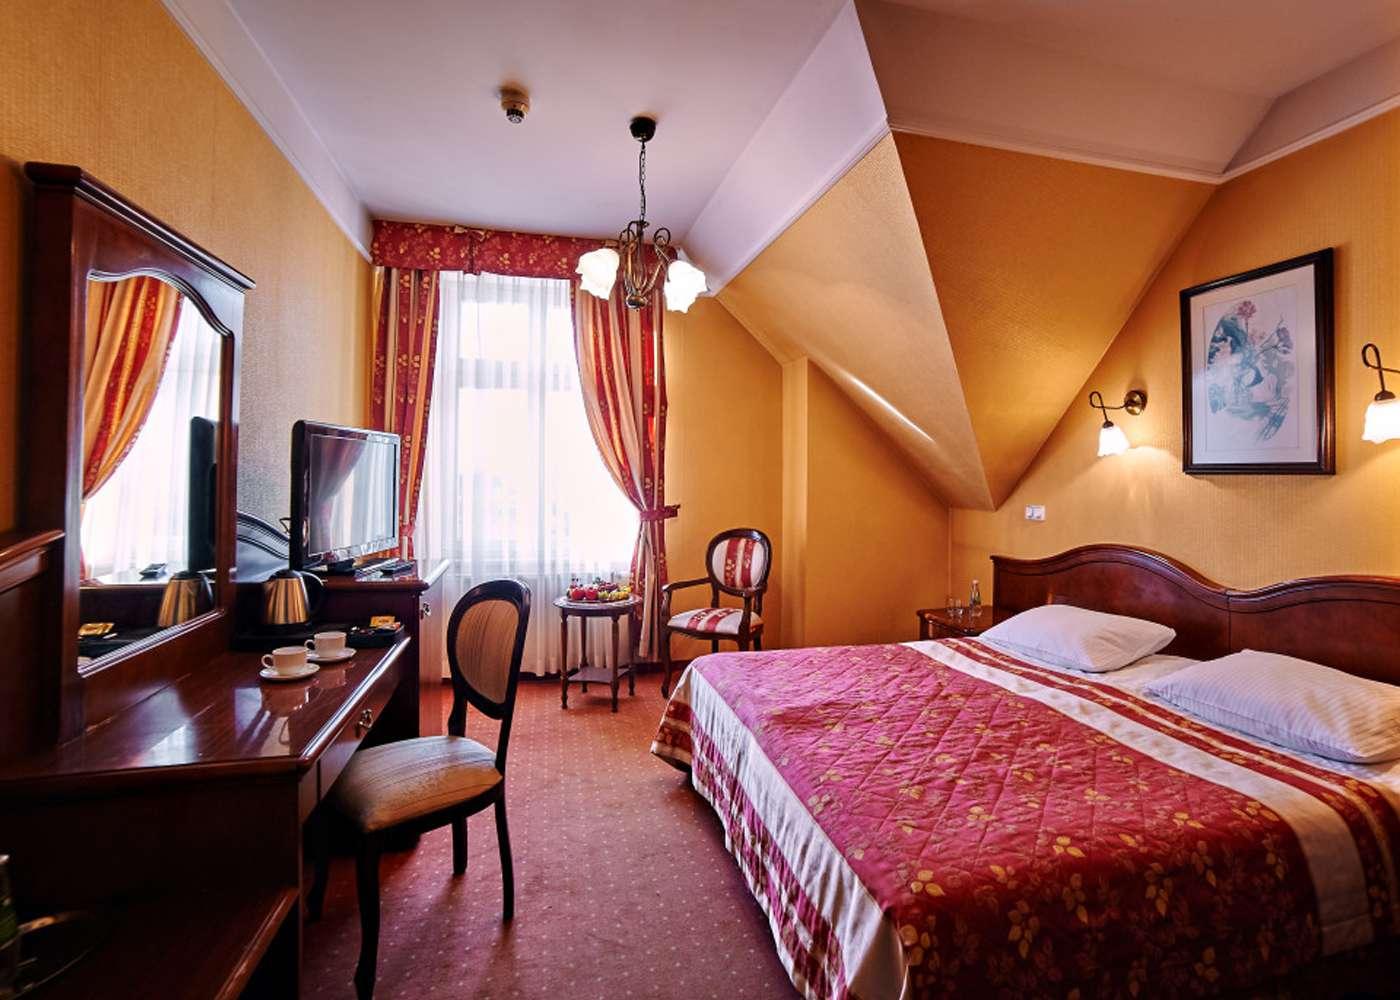 pokoje i apartamenty villa royal zdjęcie 1